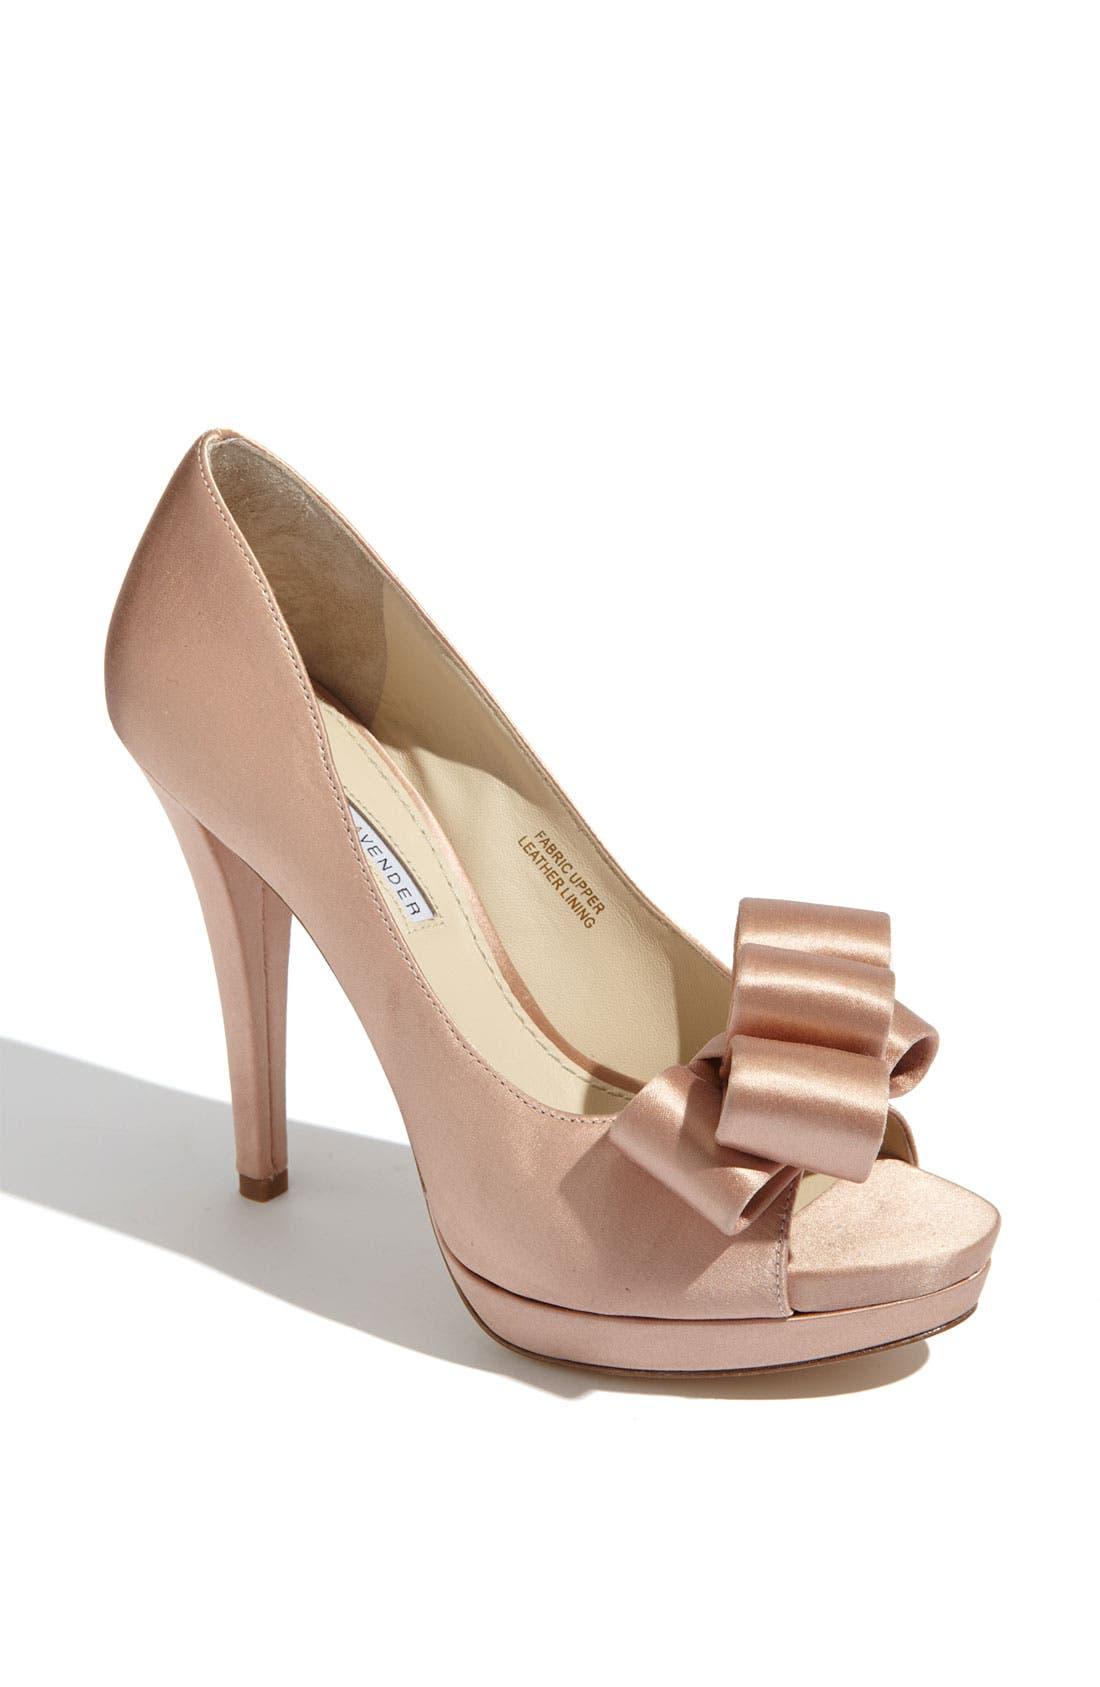 Alternate Image 1 Selected - Vera Wang Footwear 'Sammy' Peep Toe Pump